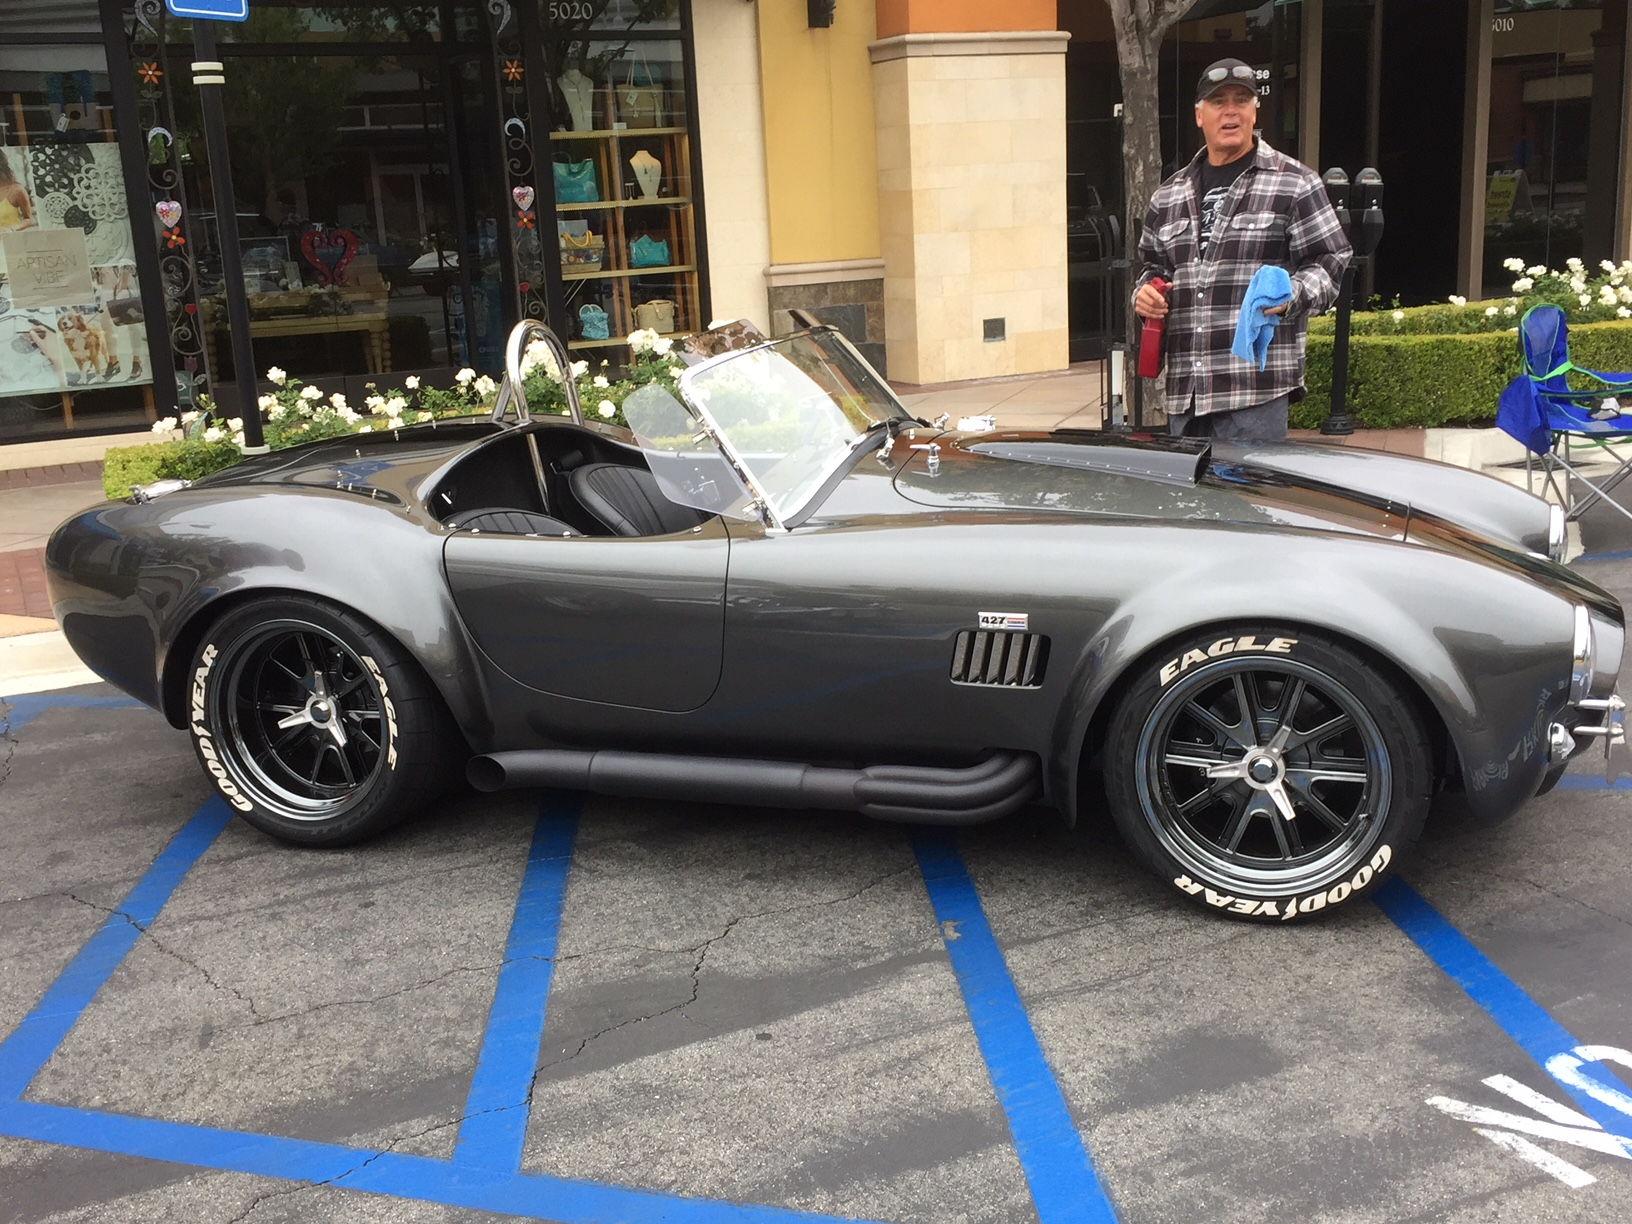 Local Car Show CorvetteForum Chevrolet Corvette Forum Discussion - Chino hills car show